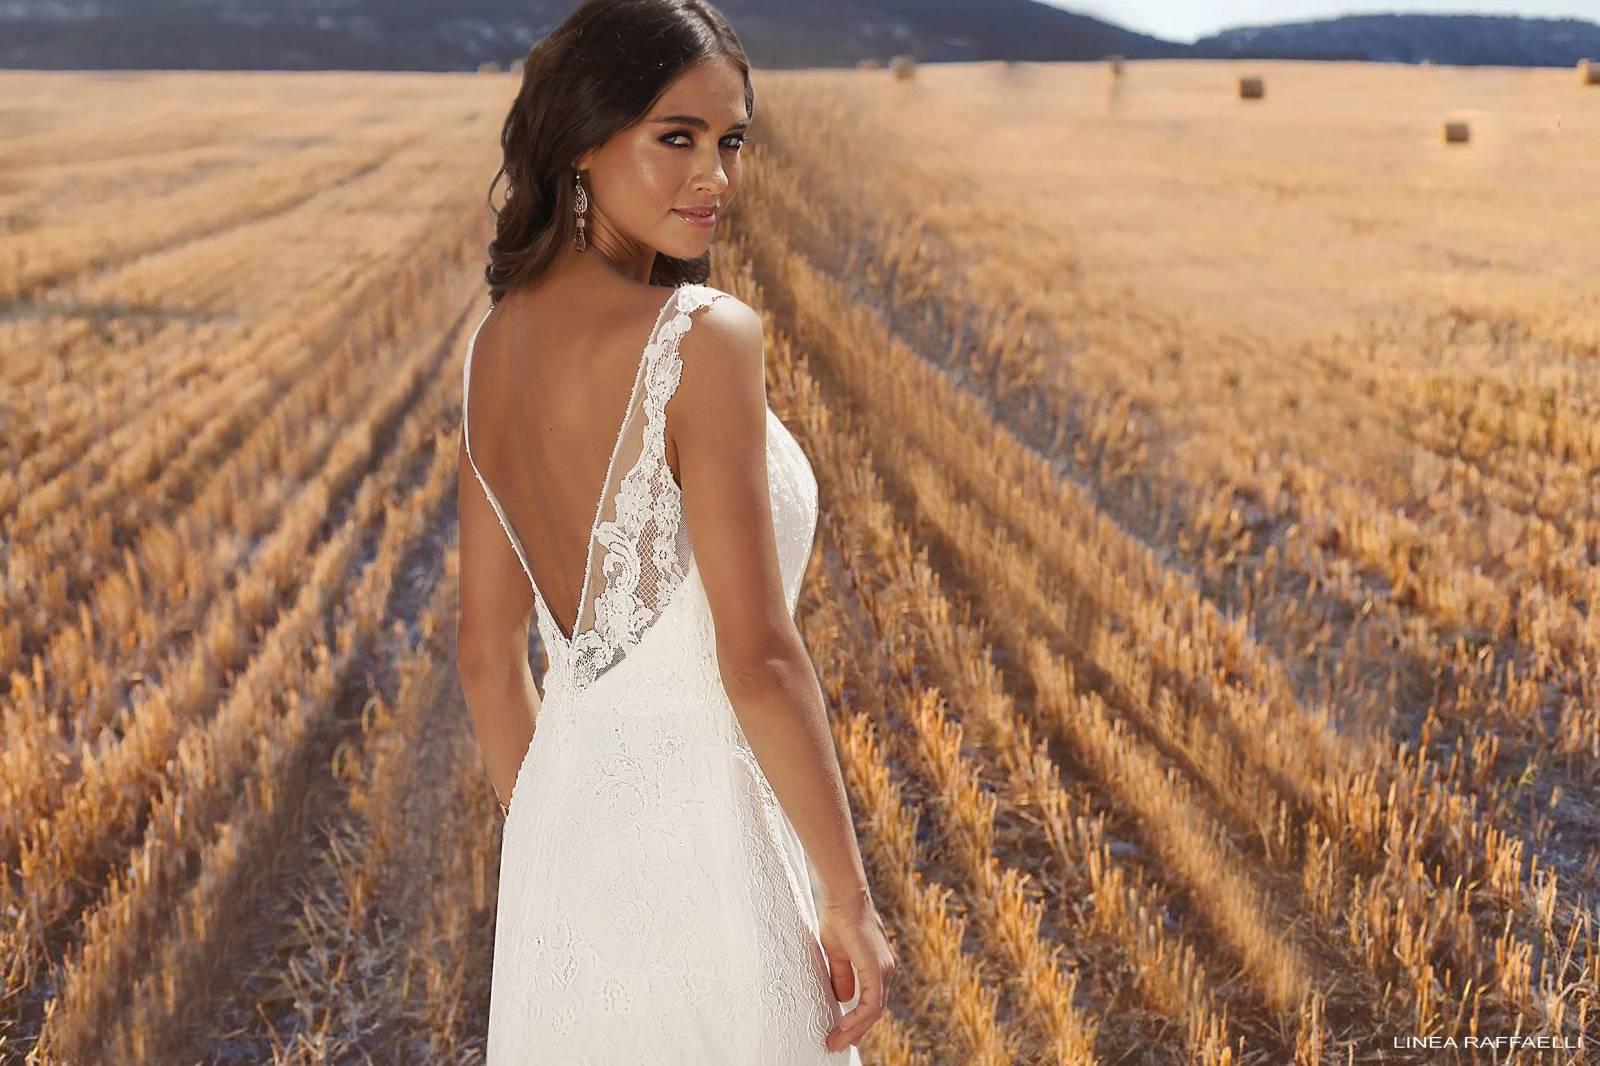 Maxim's Couture - Bruidsmode - Bruidsmodewinkel - Trouwjurk - House of Weddings - 2